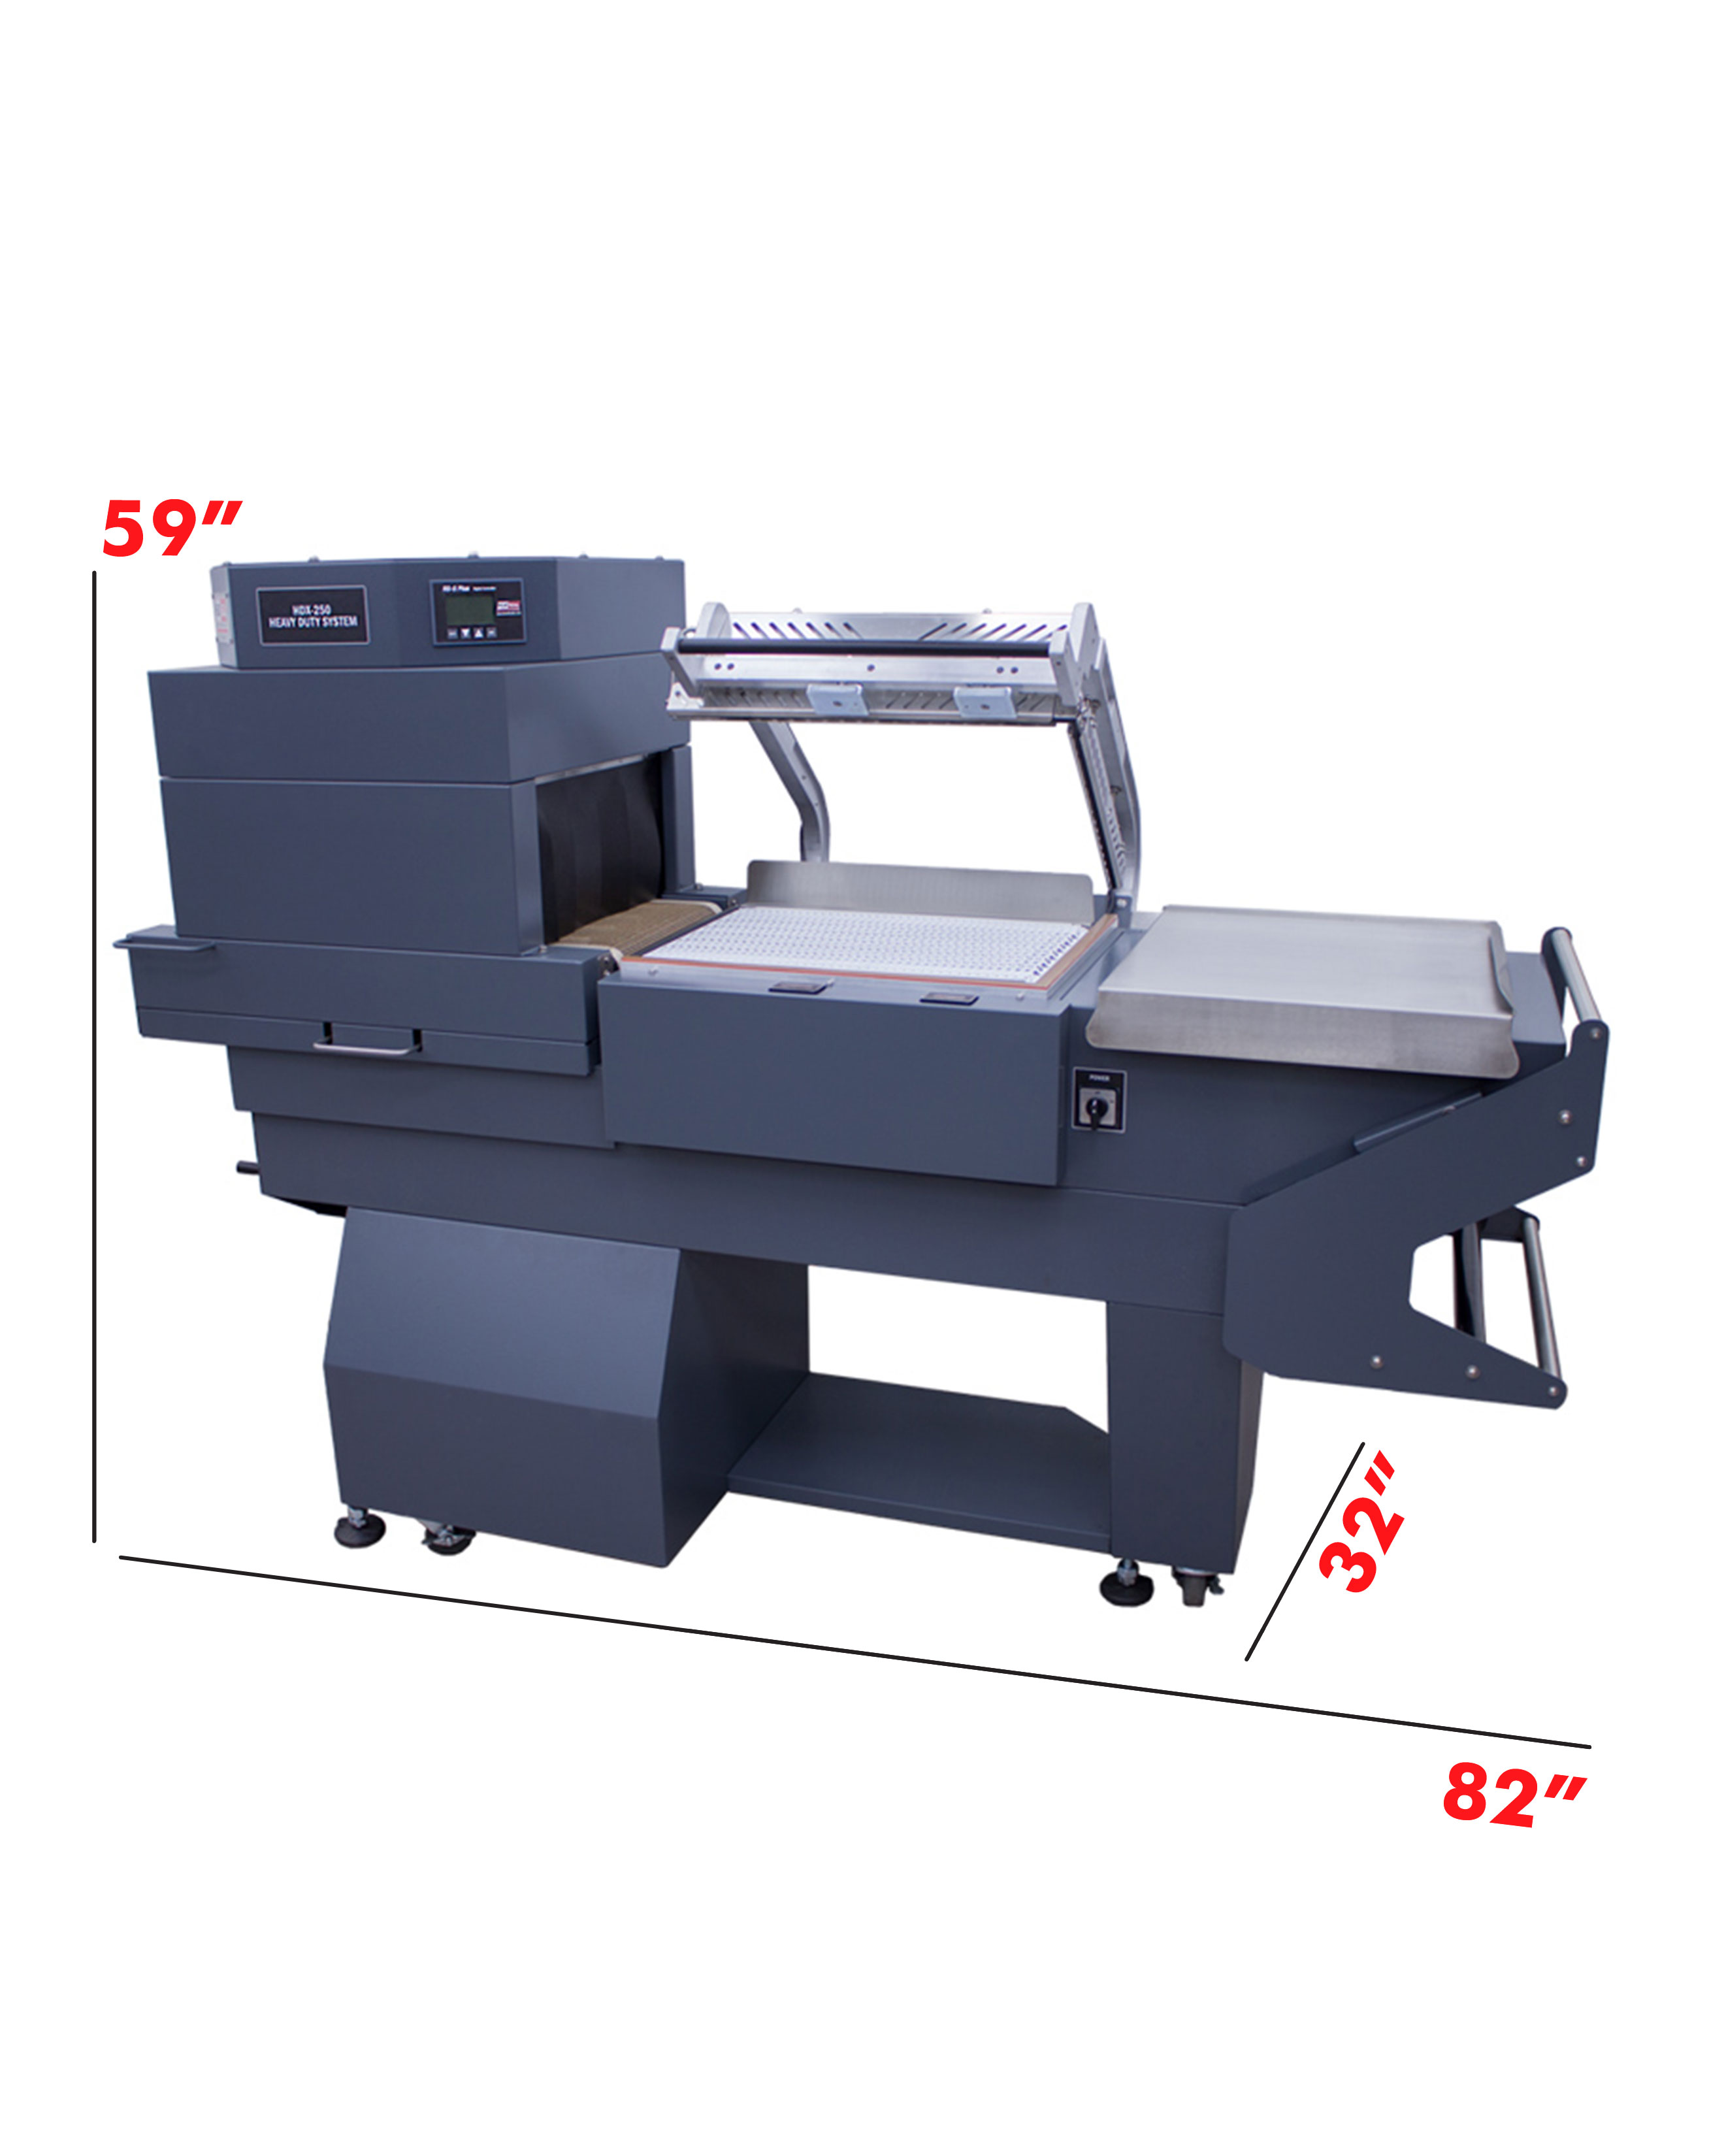 13 Inch L-Bar Sealer Dimensions